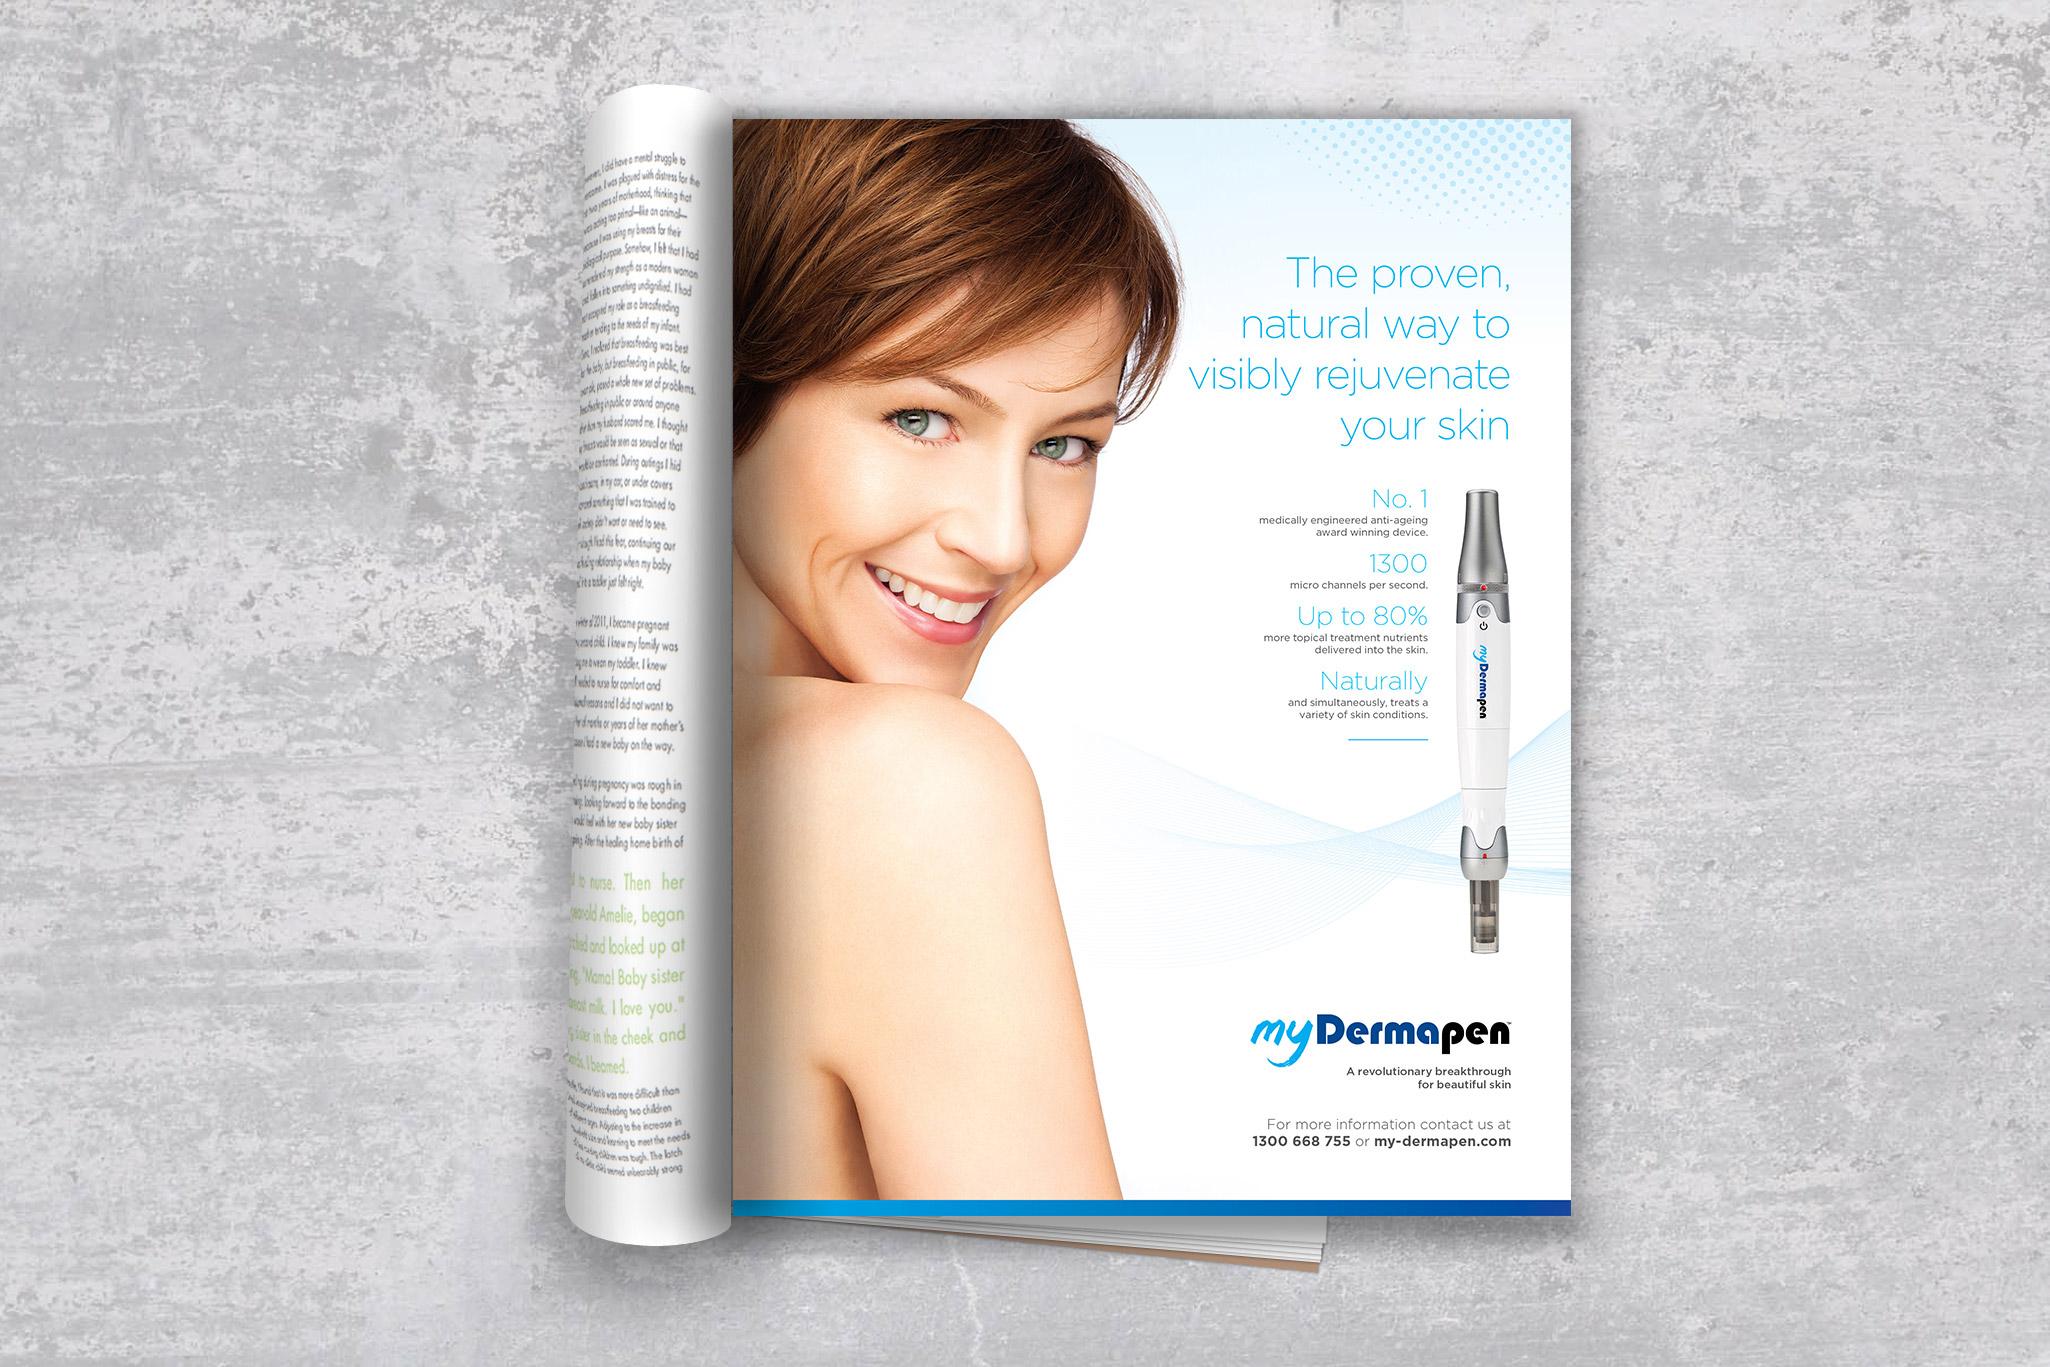 MyDermapen-Compolitan-FP-Ad.jpg